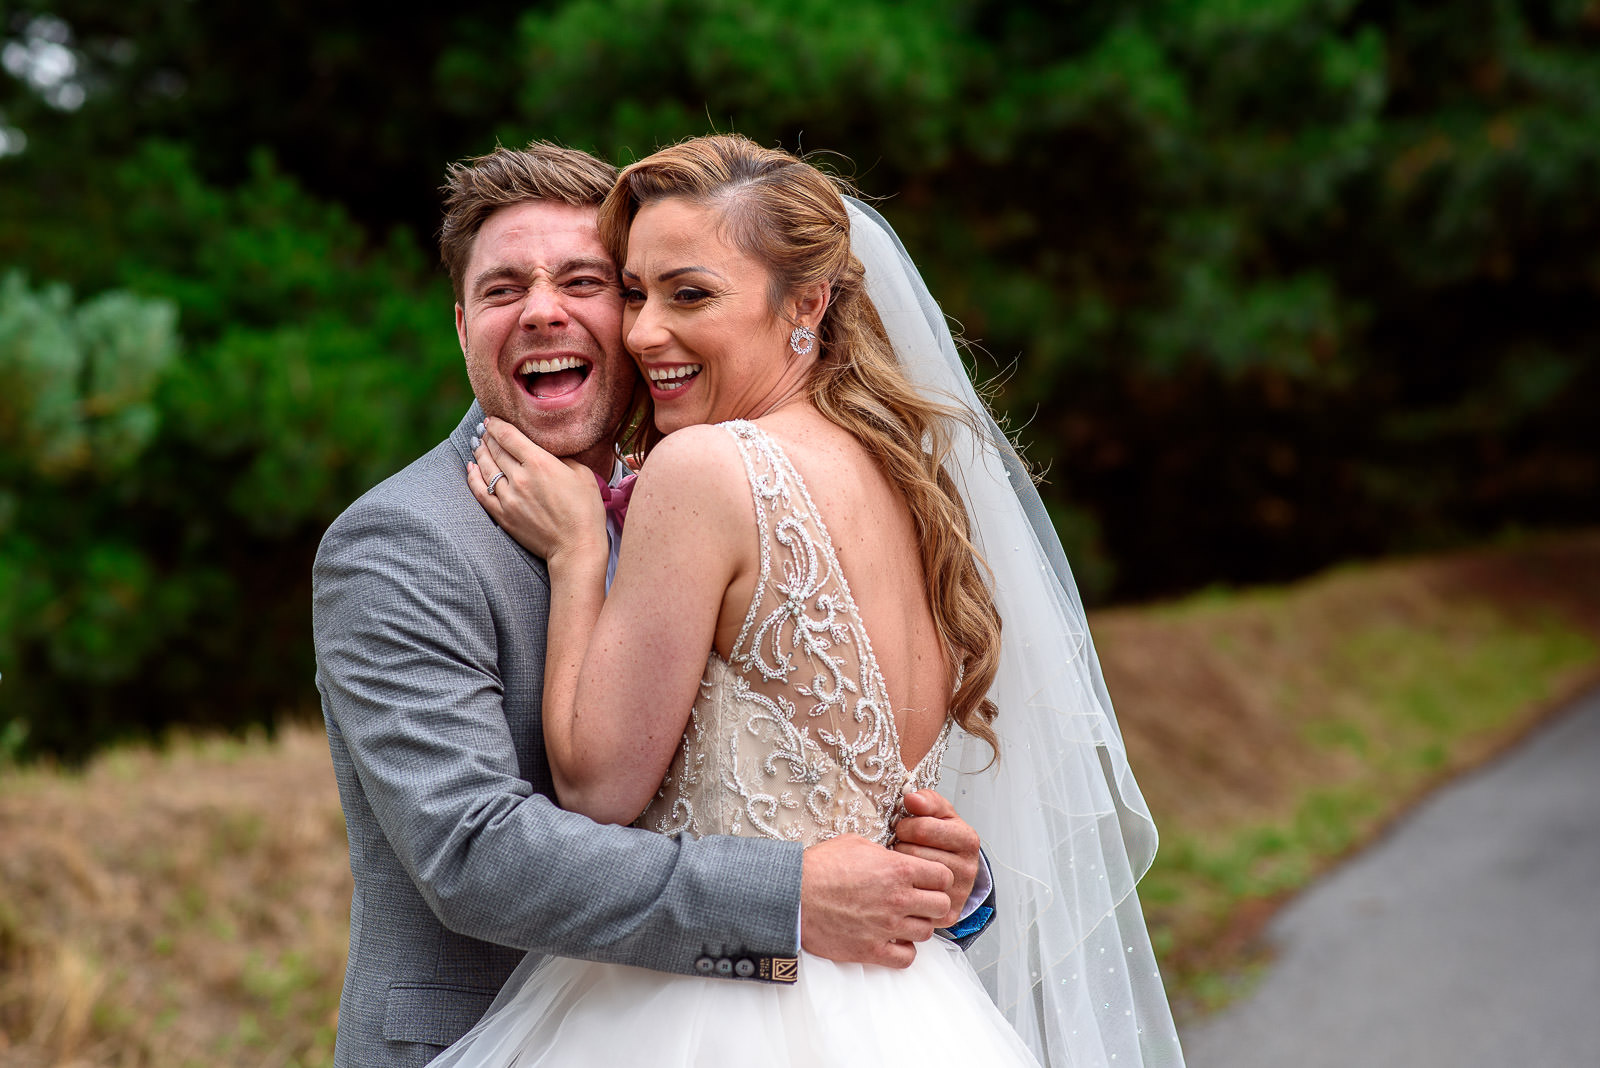 Couple taking happy Wedding photos at Oaks Farm Weddings in Croydon